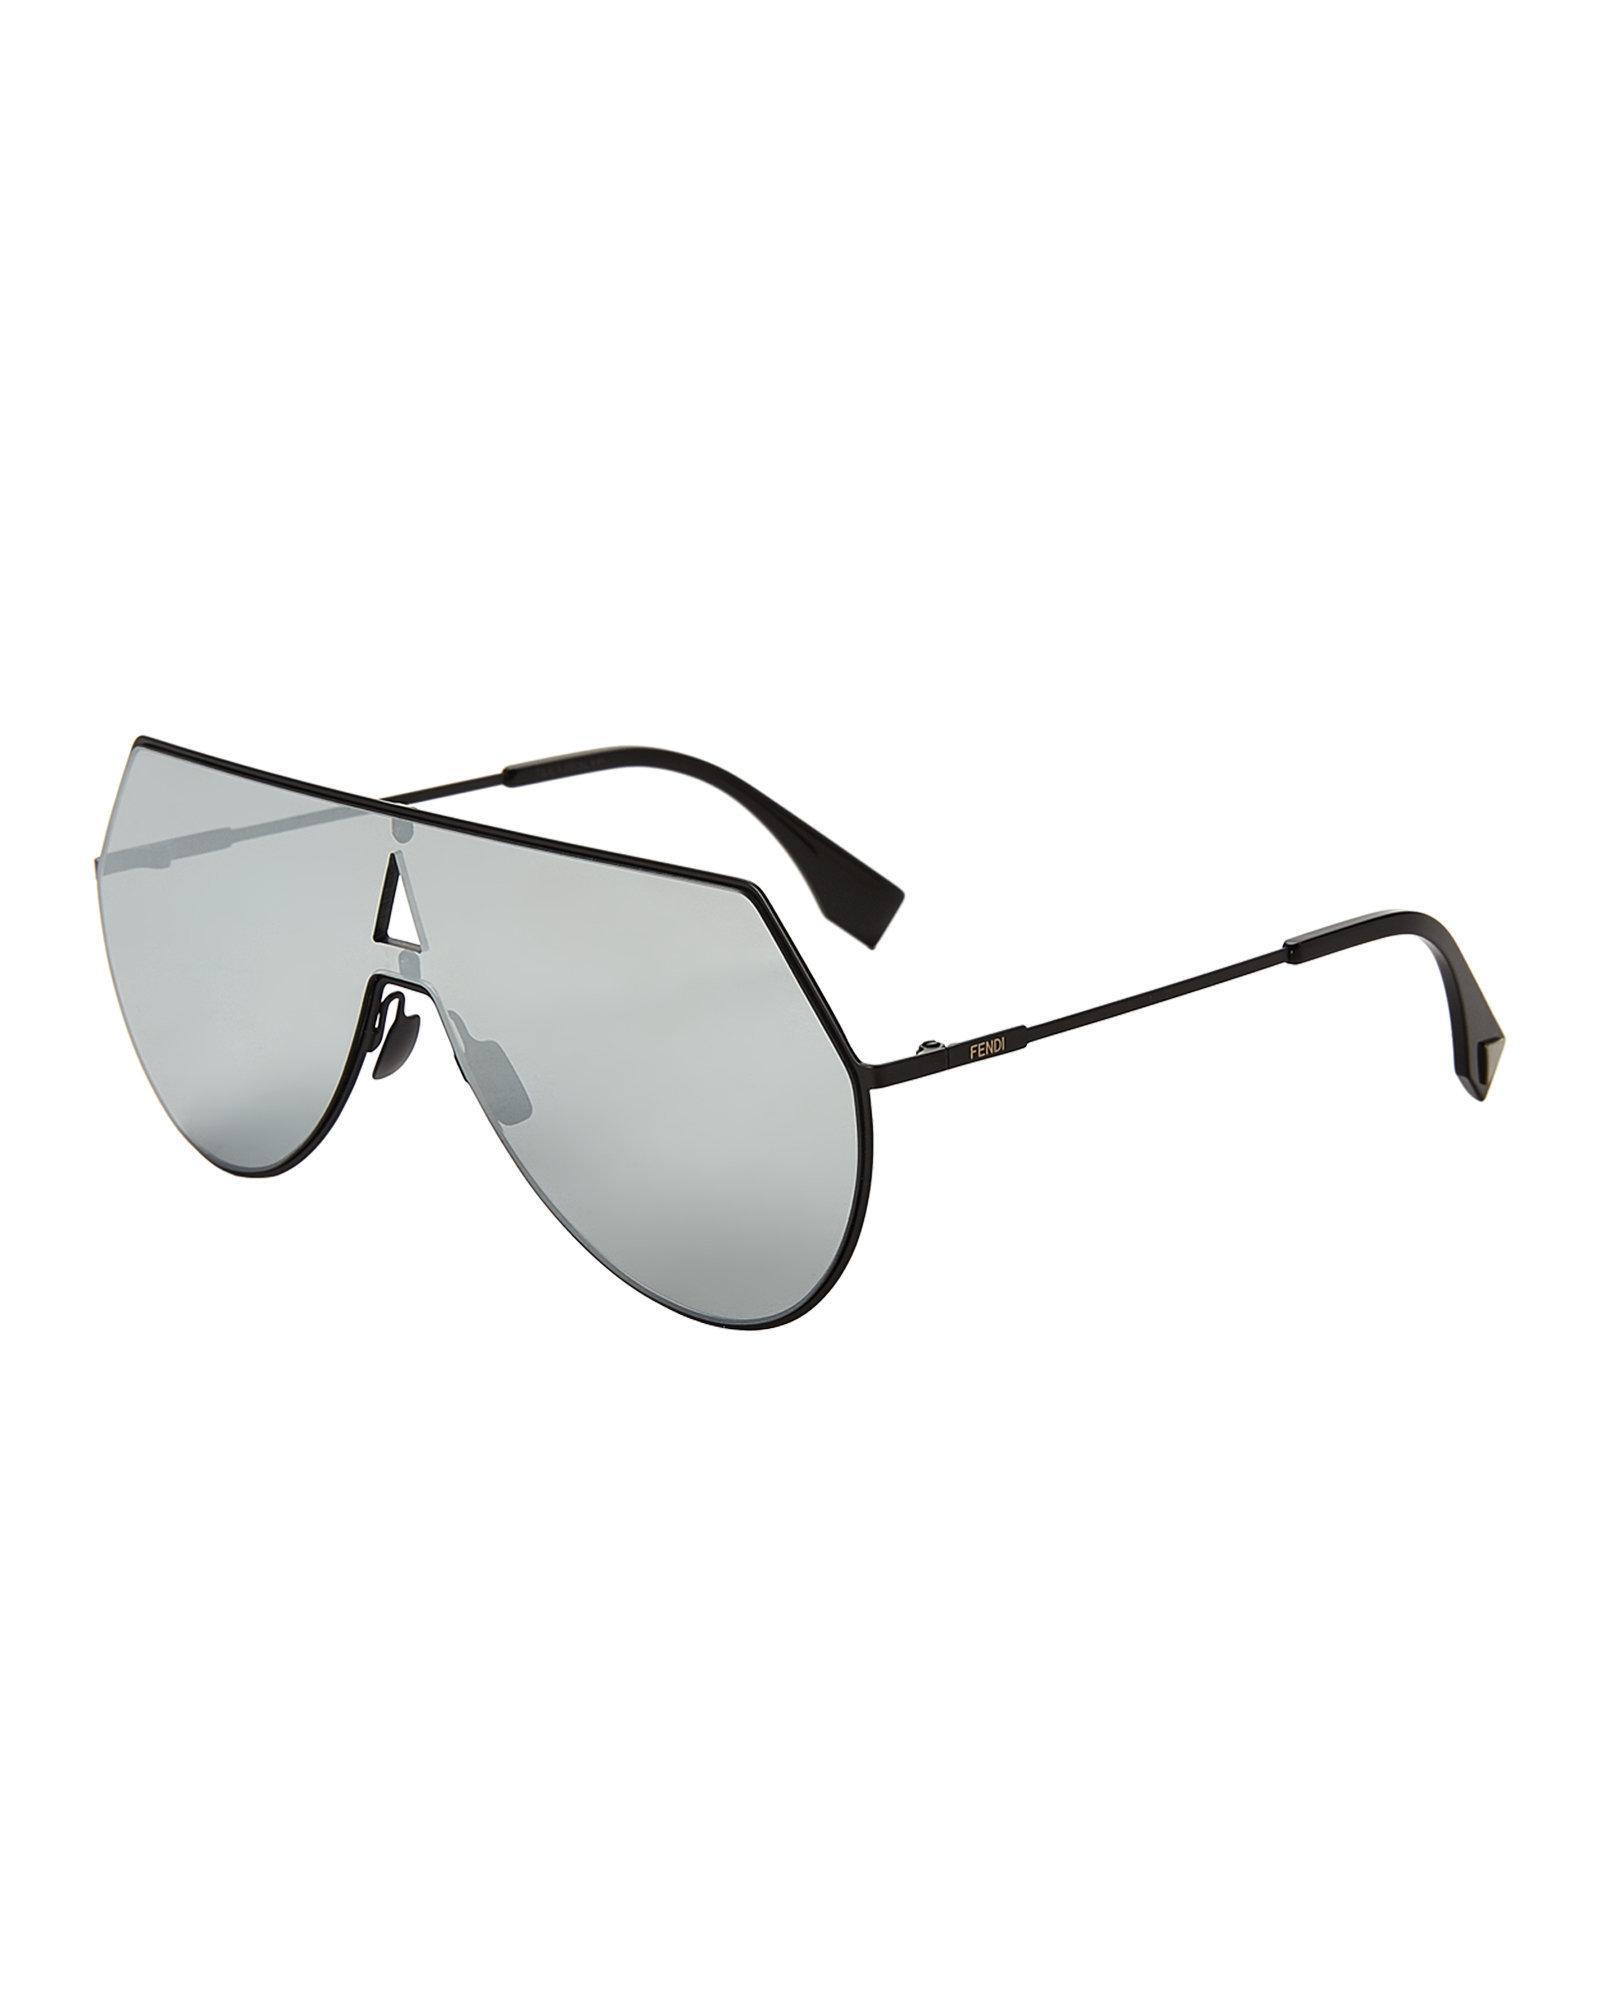 5e1b39da72d0 Lyst - Fendi Ff 0193 s Matte Black Shield Sunglasses in Black